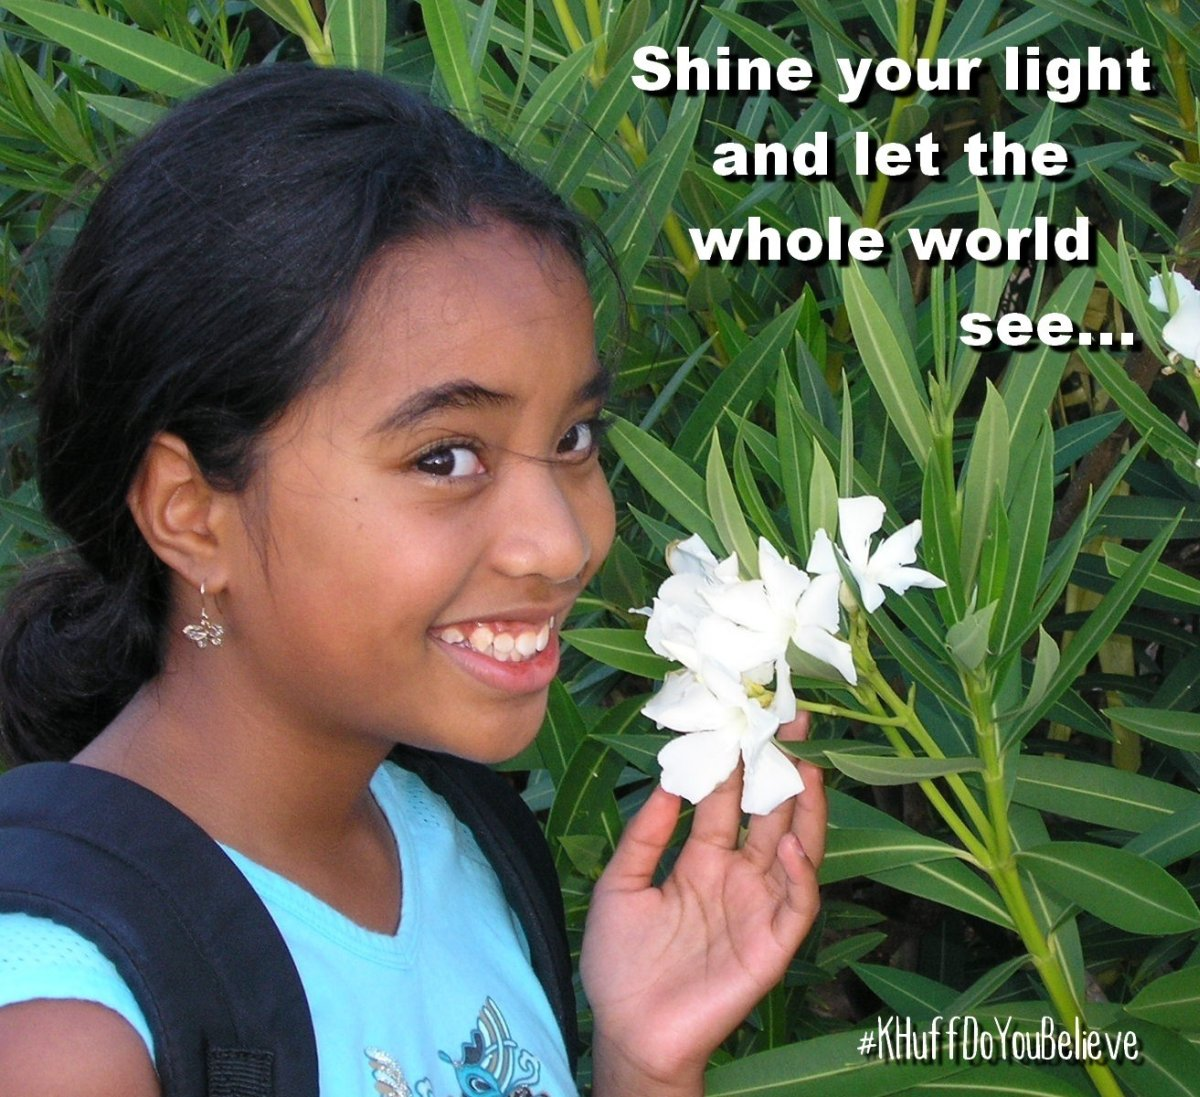 Shine His Light